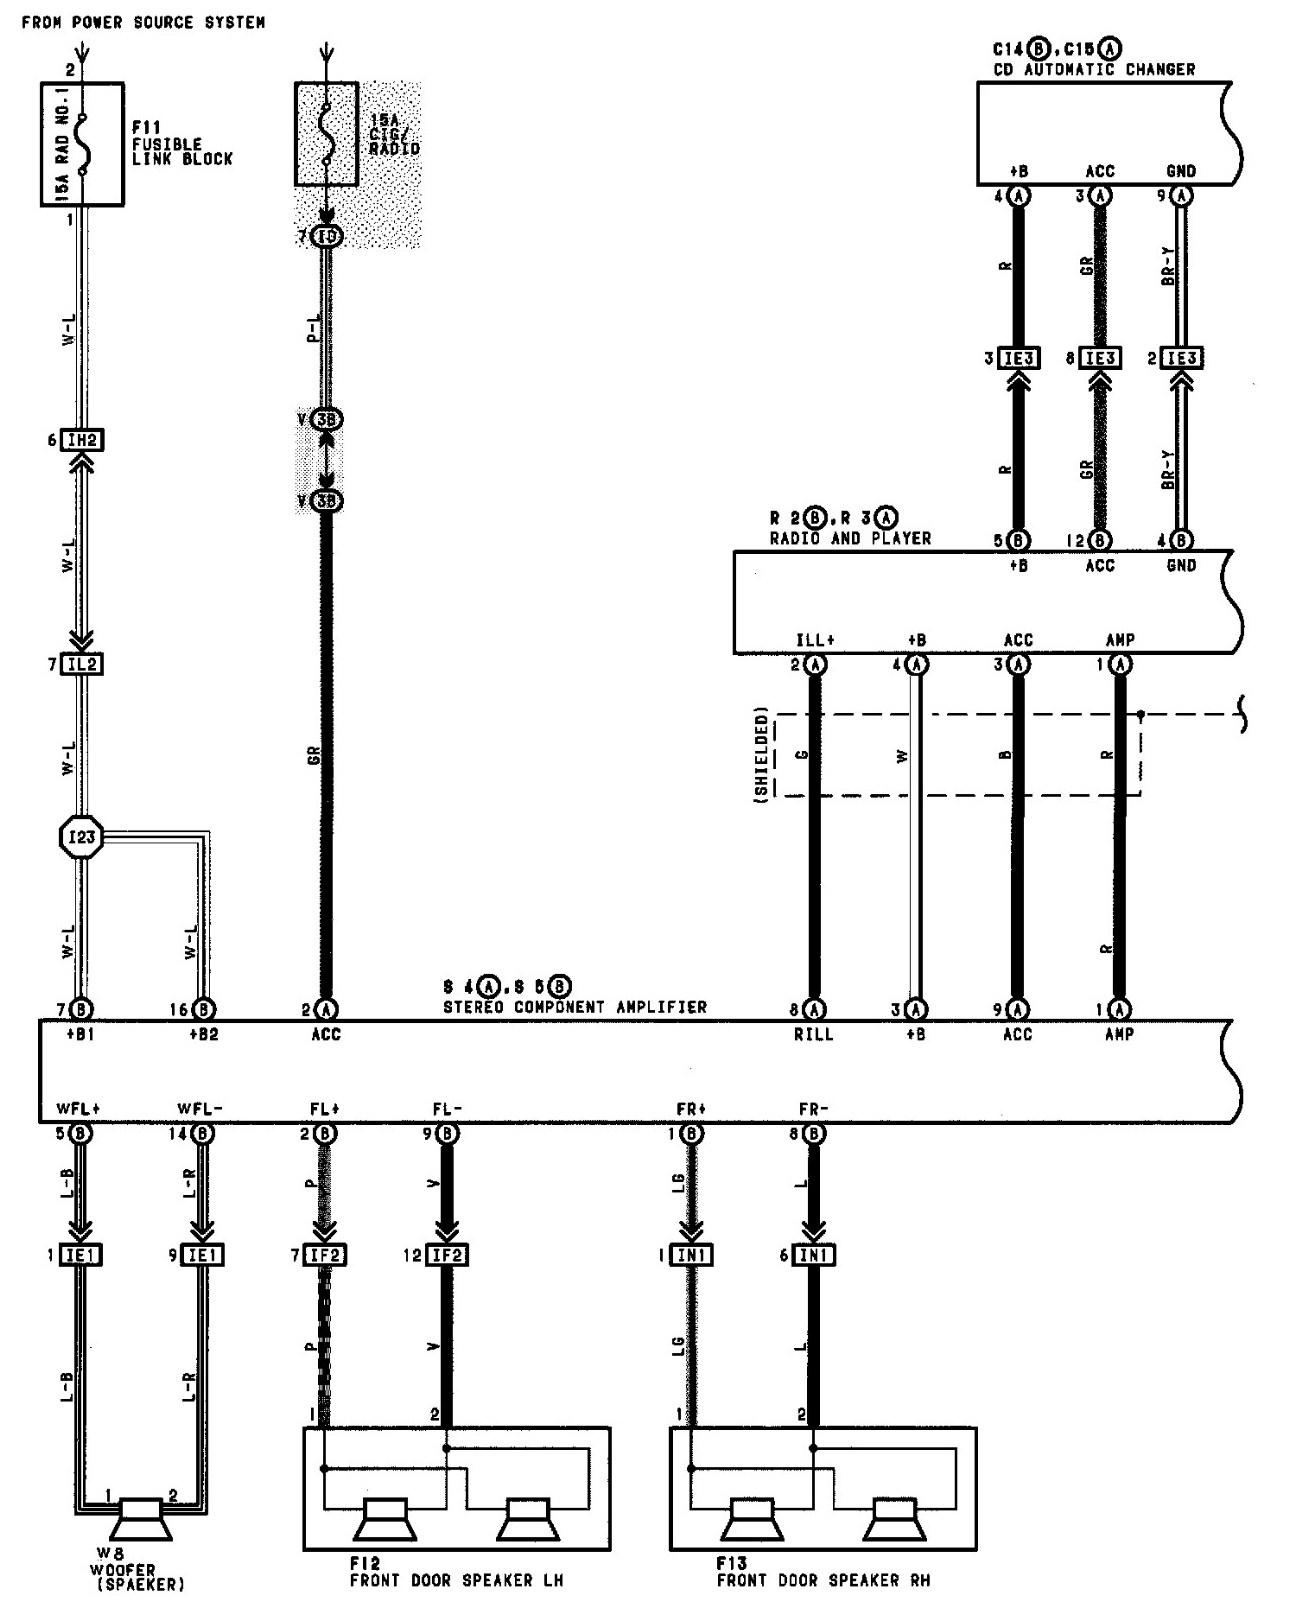 2010 toyota tundra stereo wiring harness